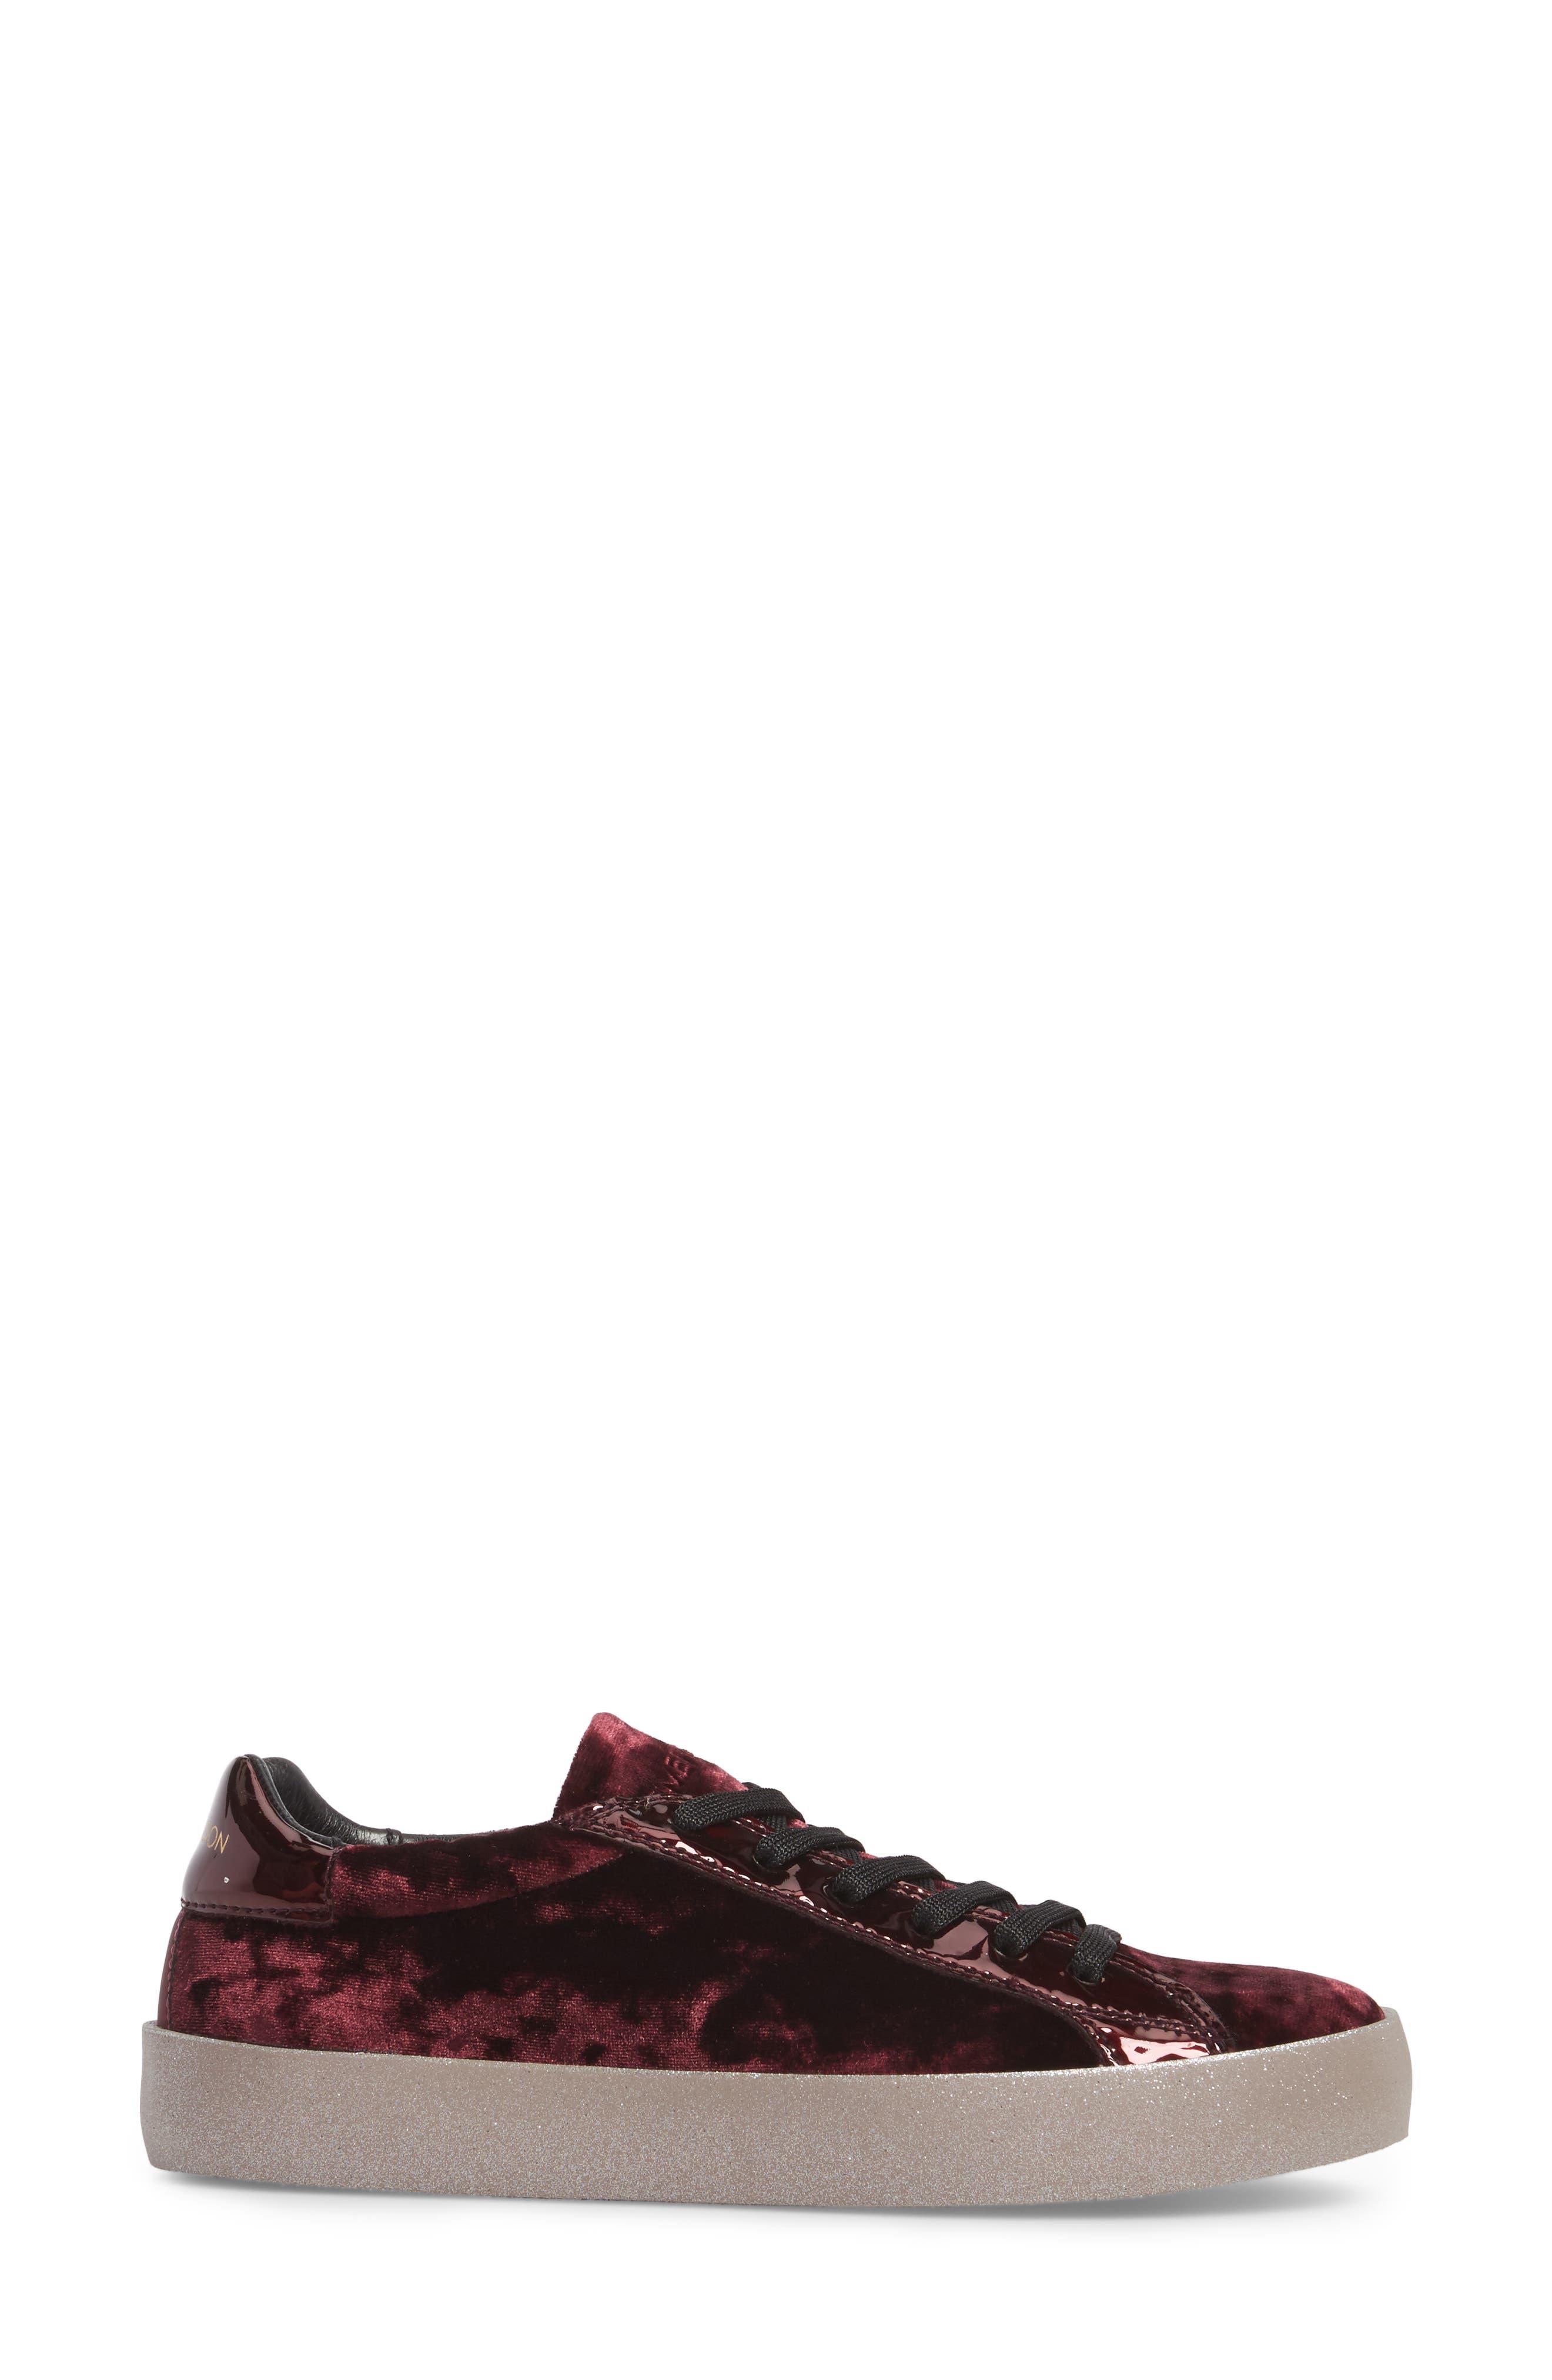 Dynamite Sneaker,                             Alternate thumbnail 3, color,                             Burgundy